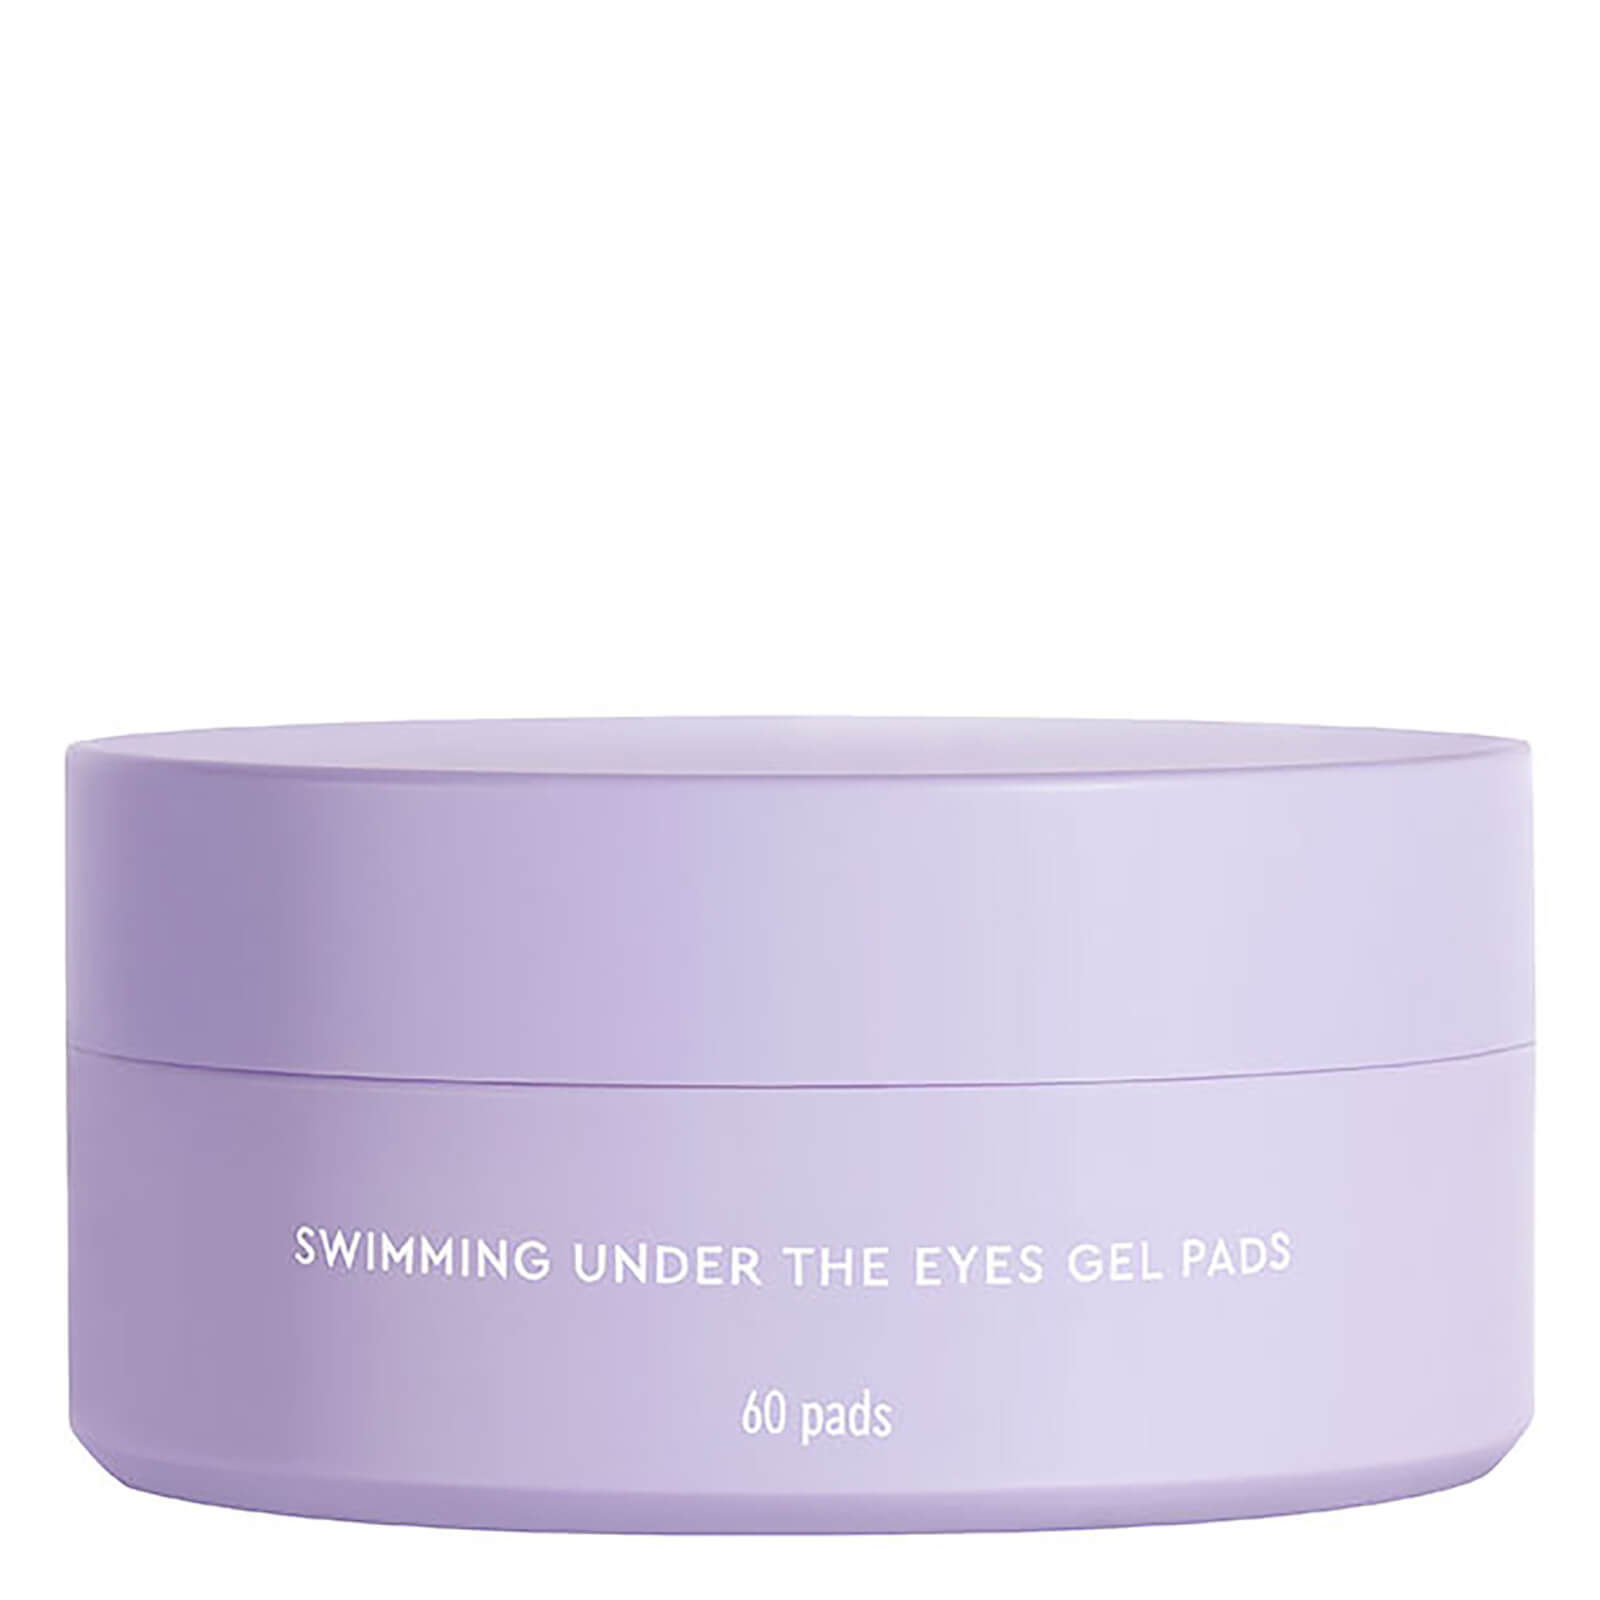 Купить Florence by Mills Swimming Under the Eyes Gel Pads 60ct